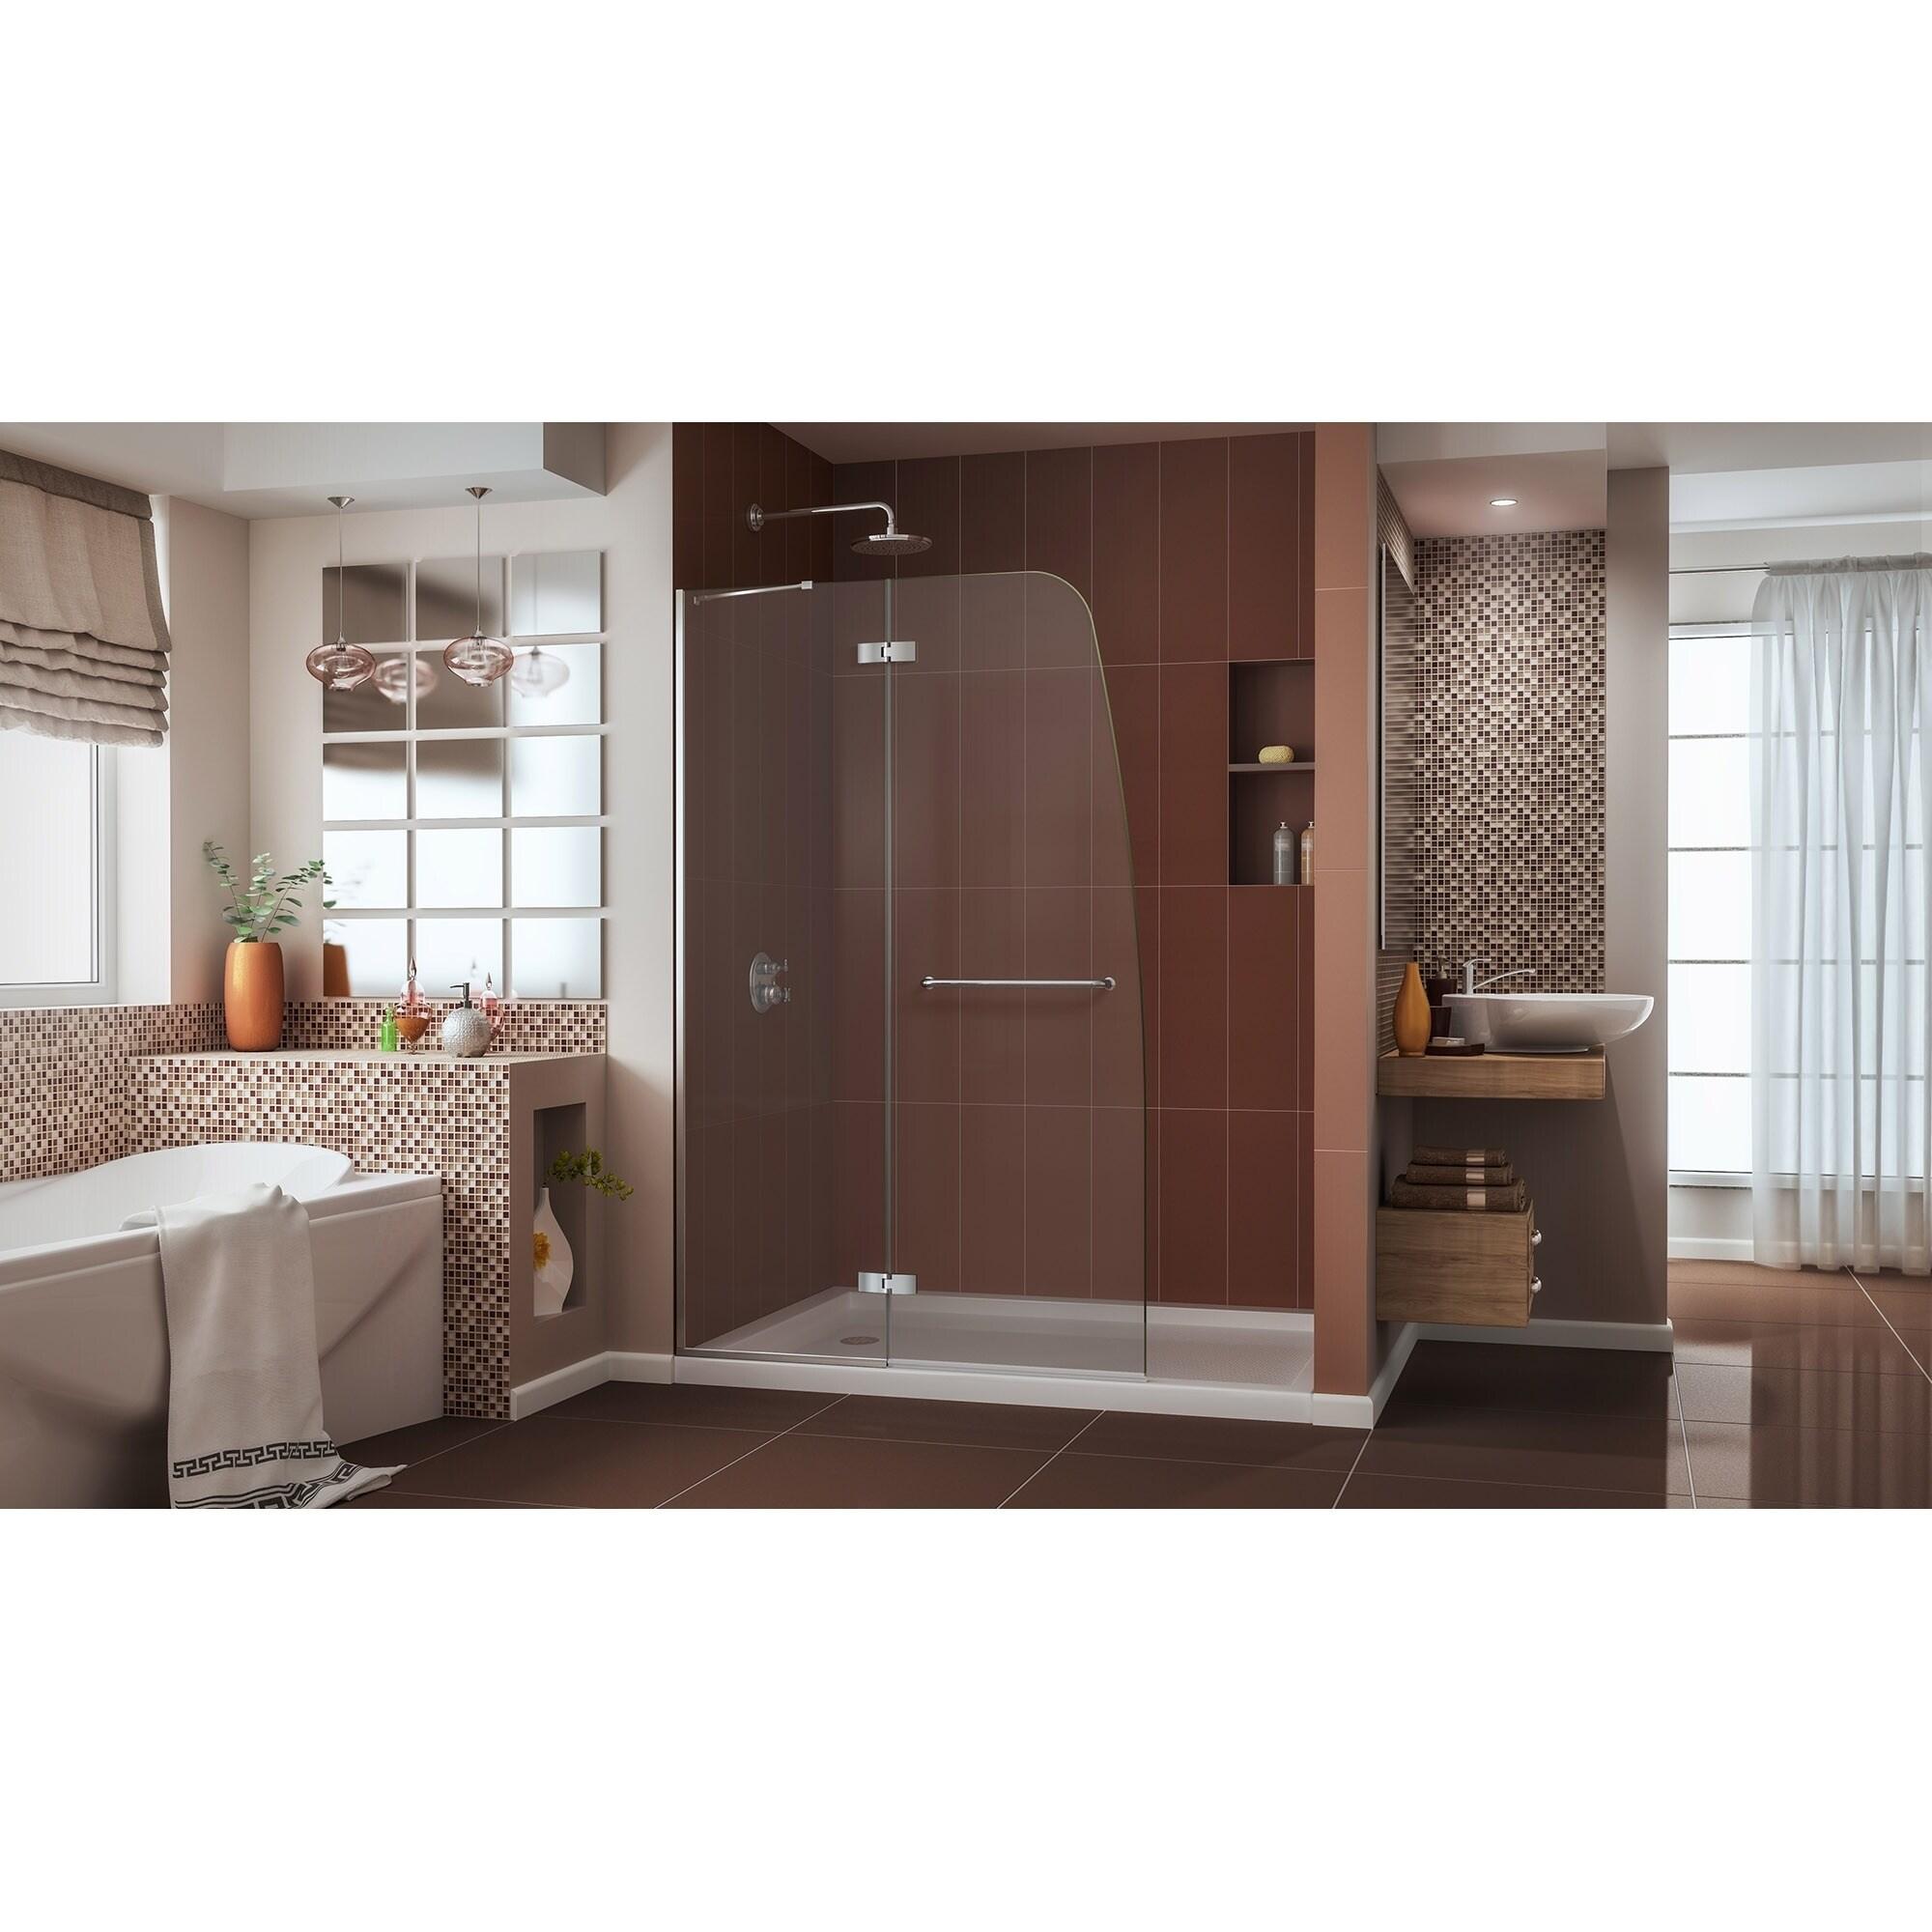 Shop DreamLine Aqua Ultra 45 in. Frameless Hinged Shower Door - Free ...